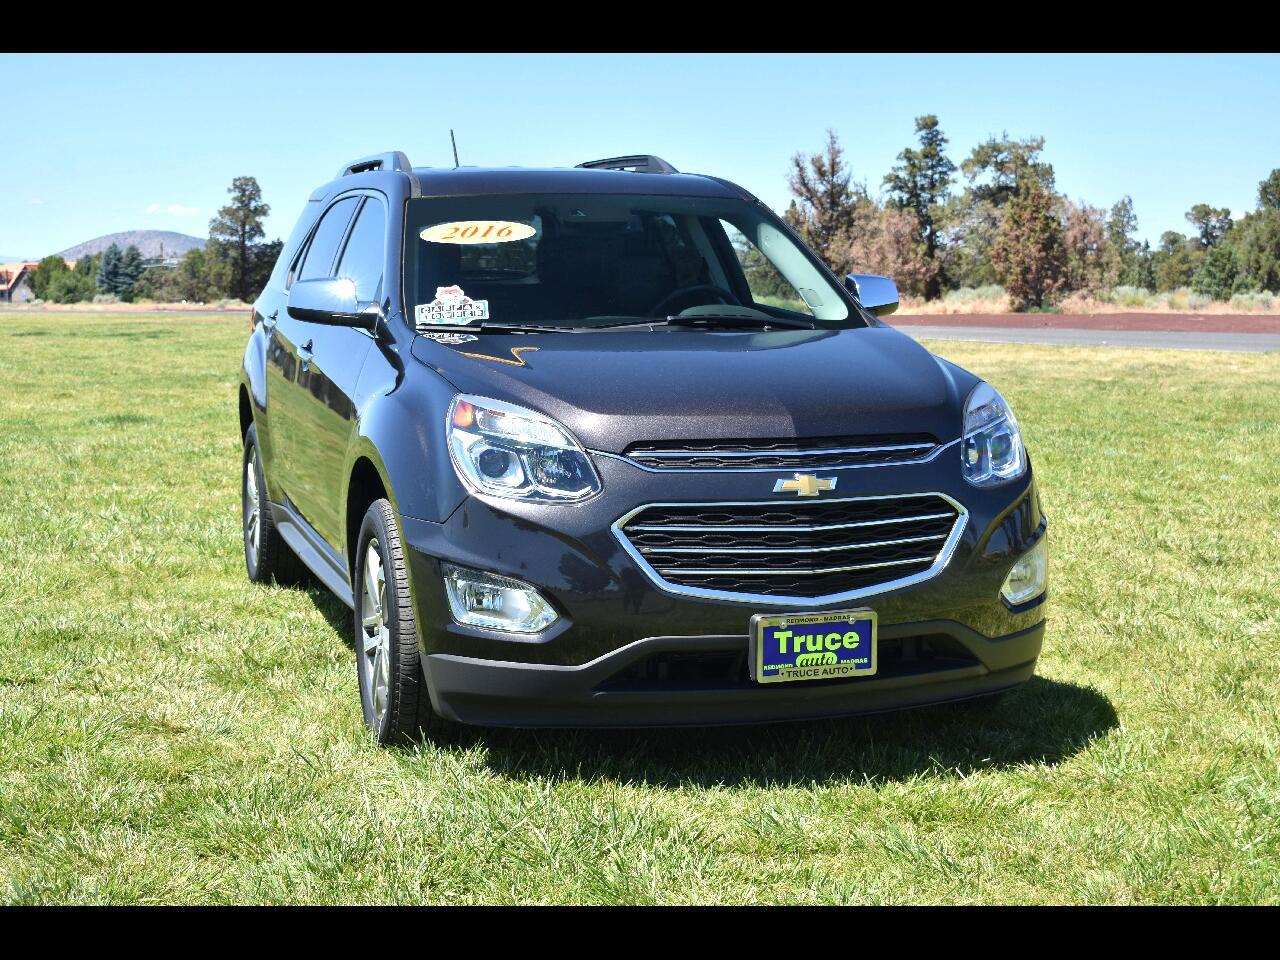 2016 Chevrolet Equinox AWD 4DR LTZ***LOW LOW MILES***